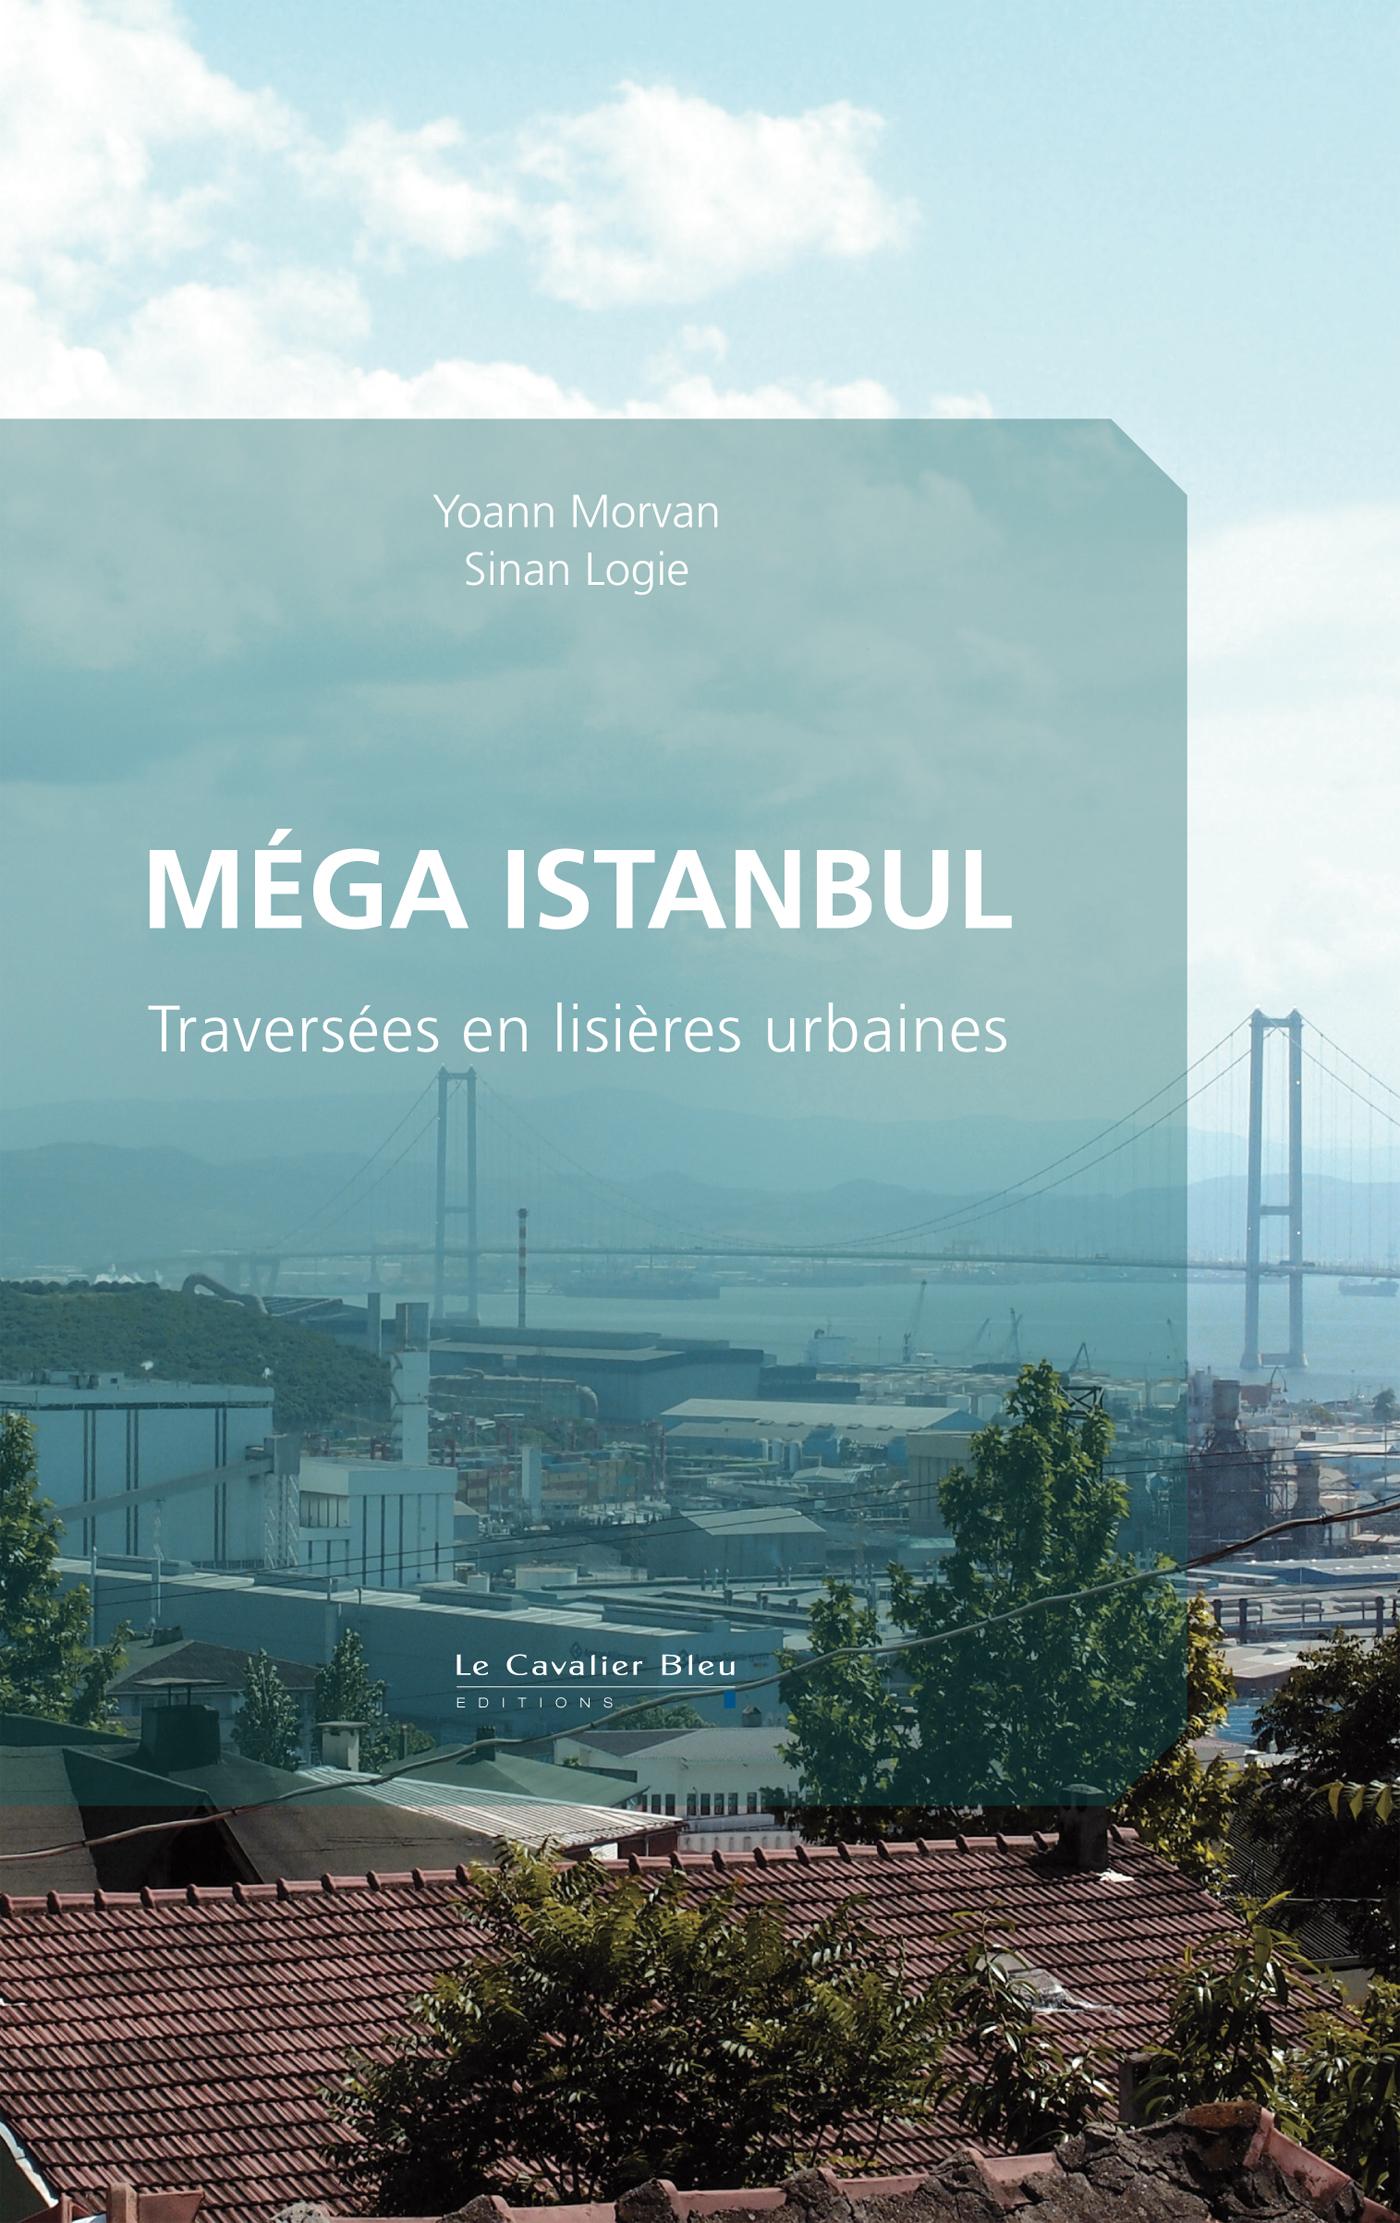 MEGA ISTANBUL - TRAVERSEES EN LISIERES URBAINES